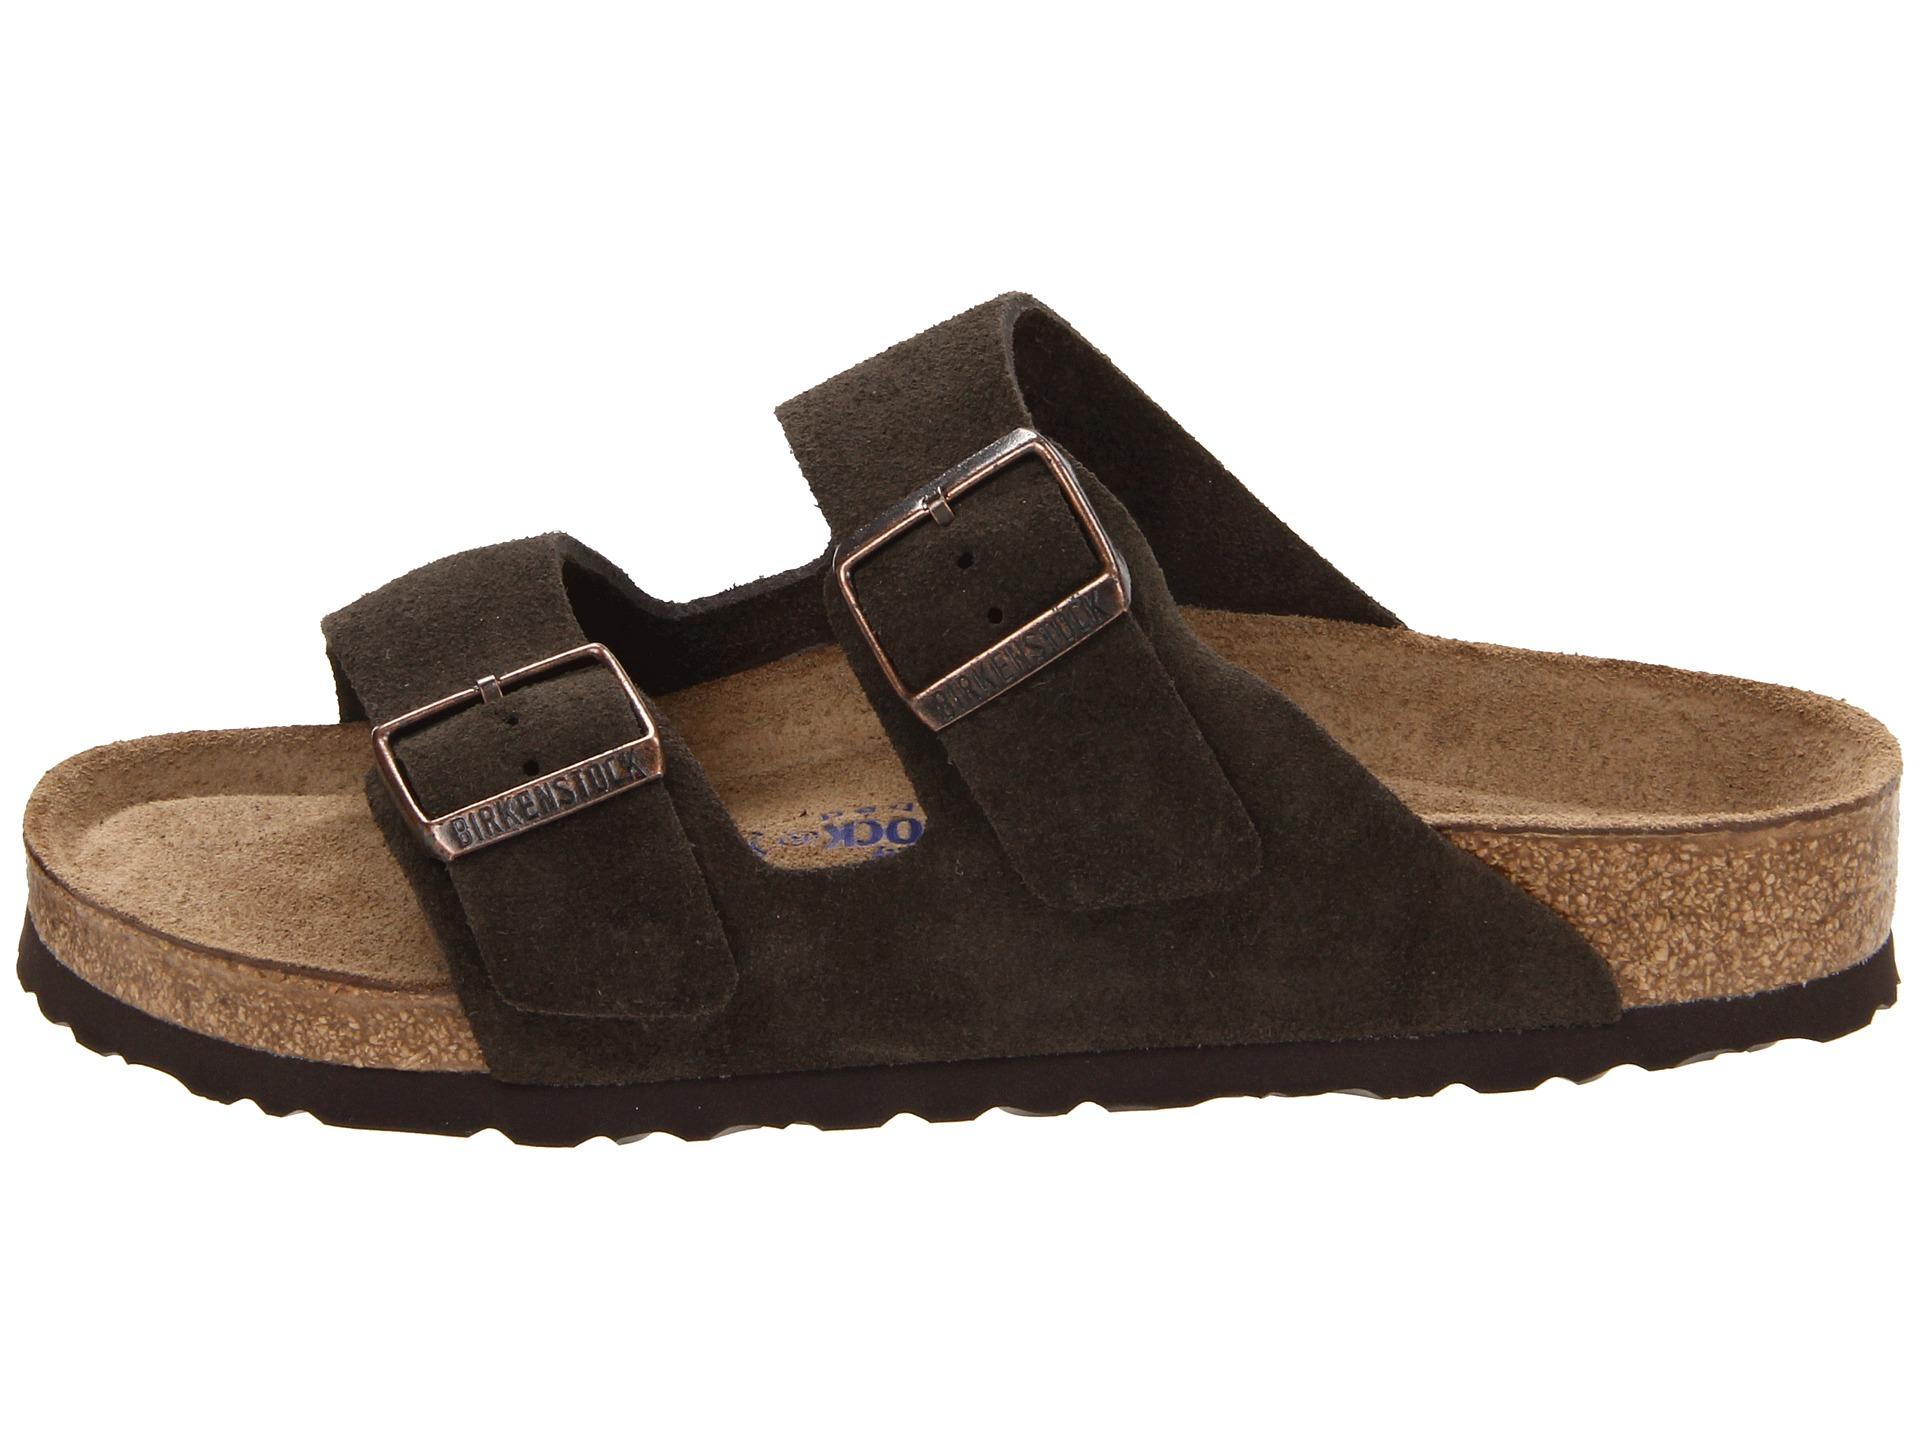 birkenstock arizona mocha suede with soft footbed